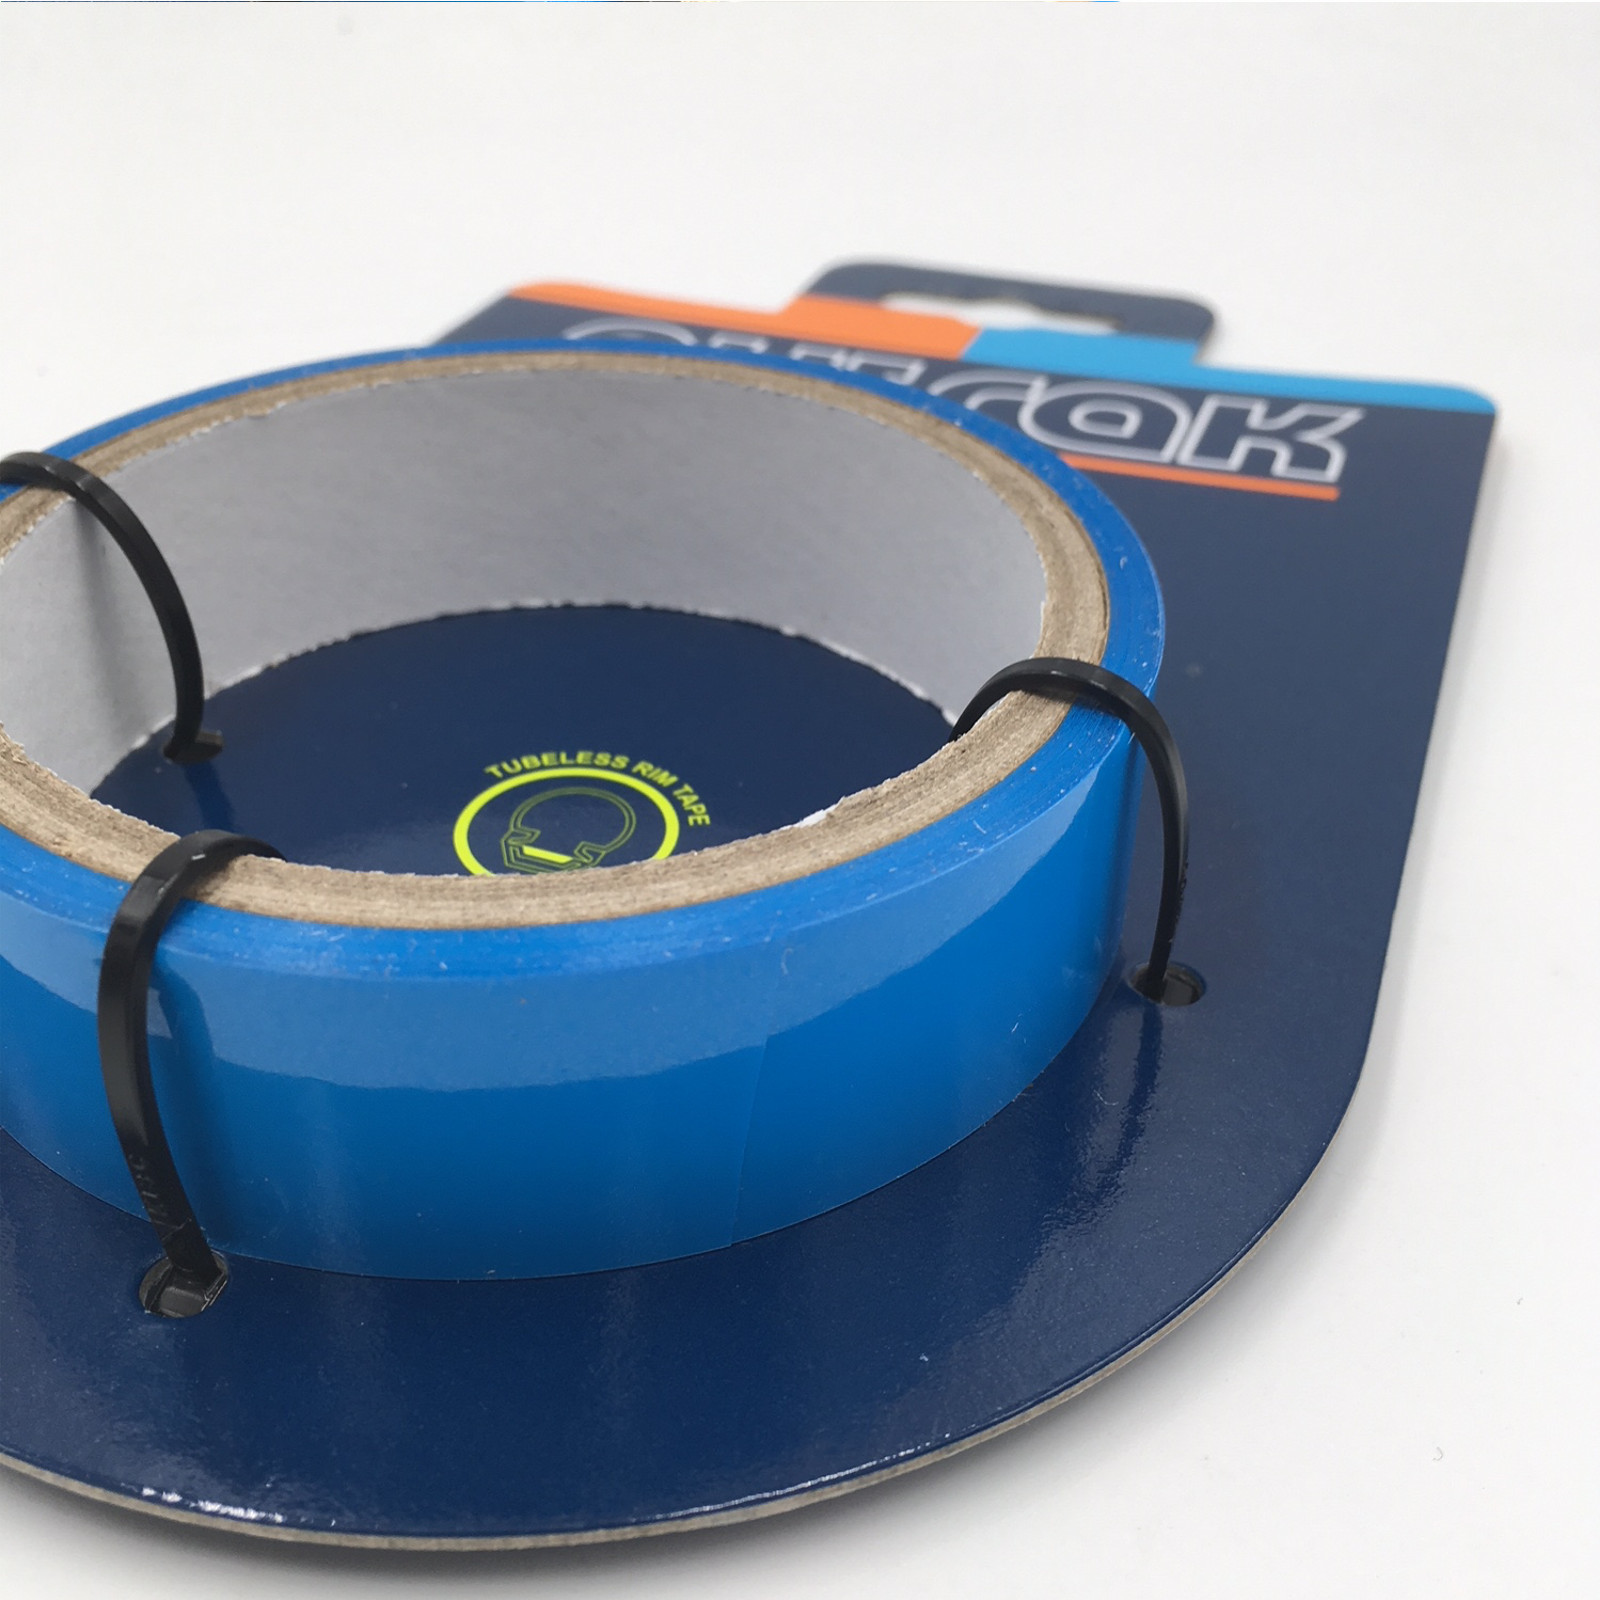 Nutrak-Tubeless-Ready-Waterproof-Rim-Tape-Blue-10m-Roll thumbnail 12